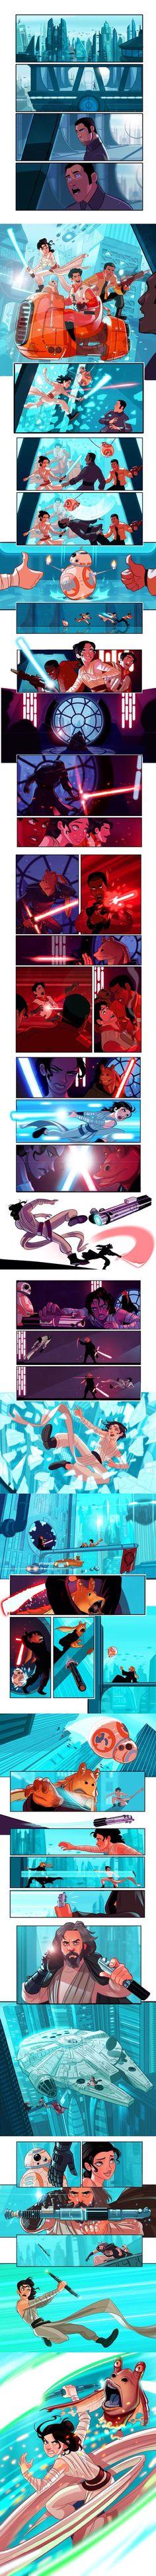 Star Wars The Force Awakens. Rey, Poe, Finn, BB-8